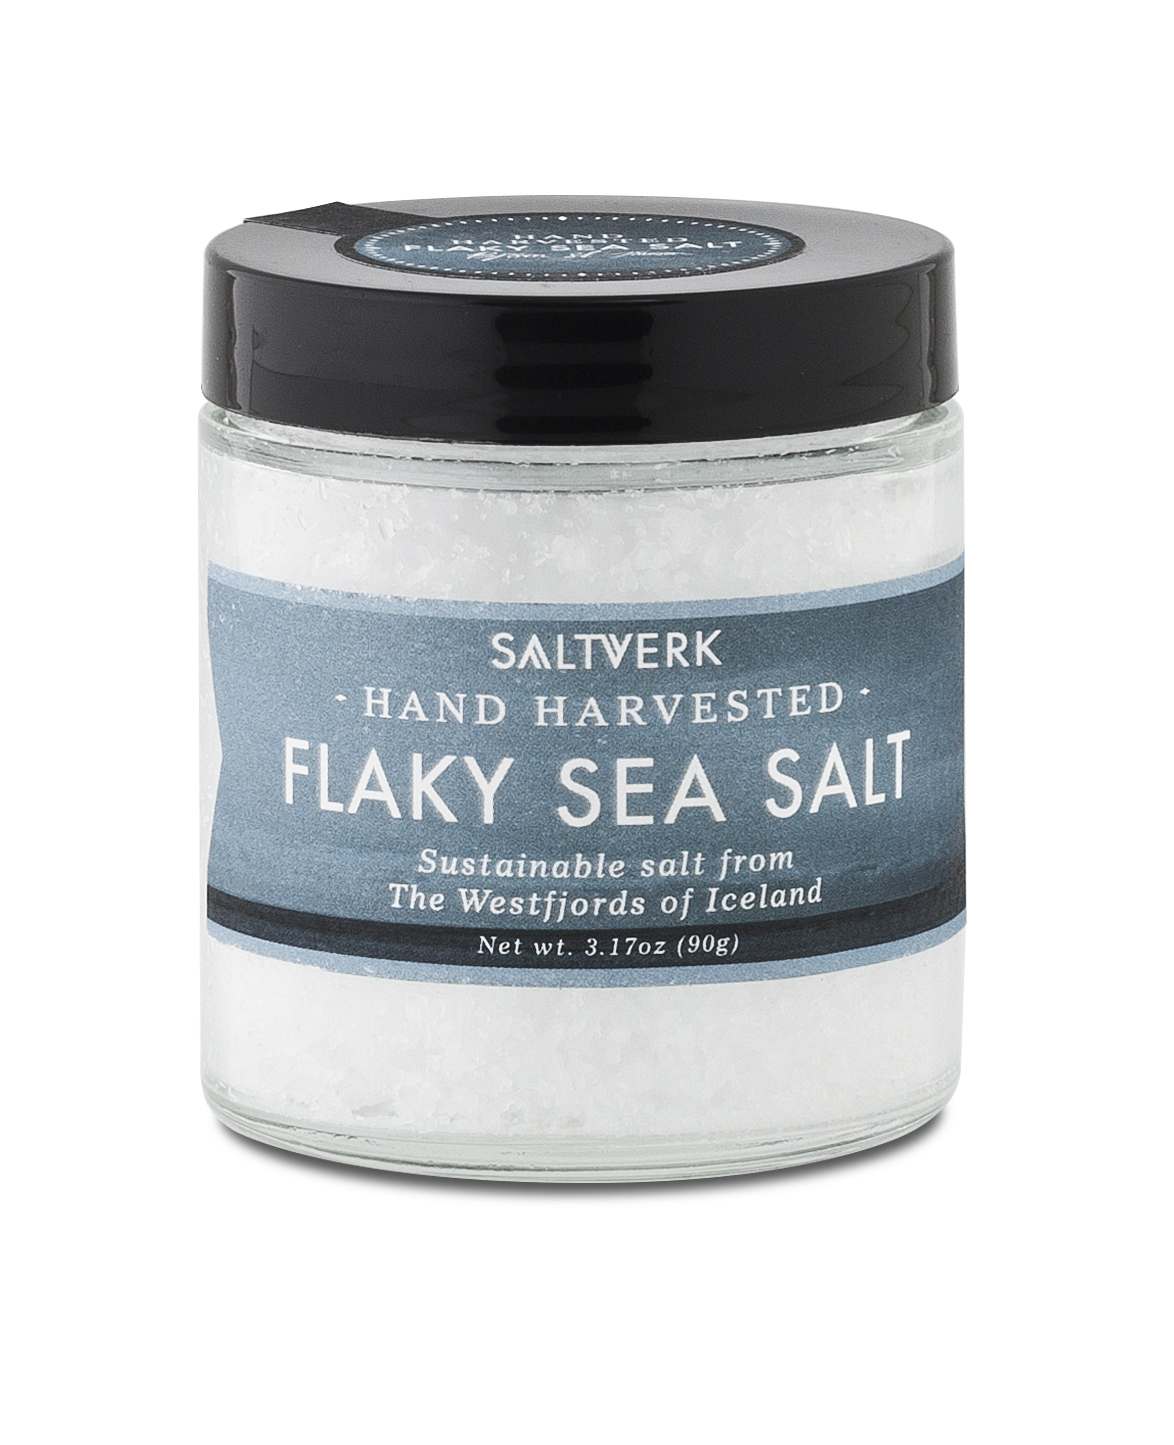 bøtte_Sea_salt.jpg